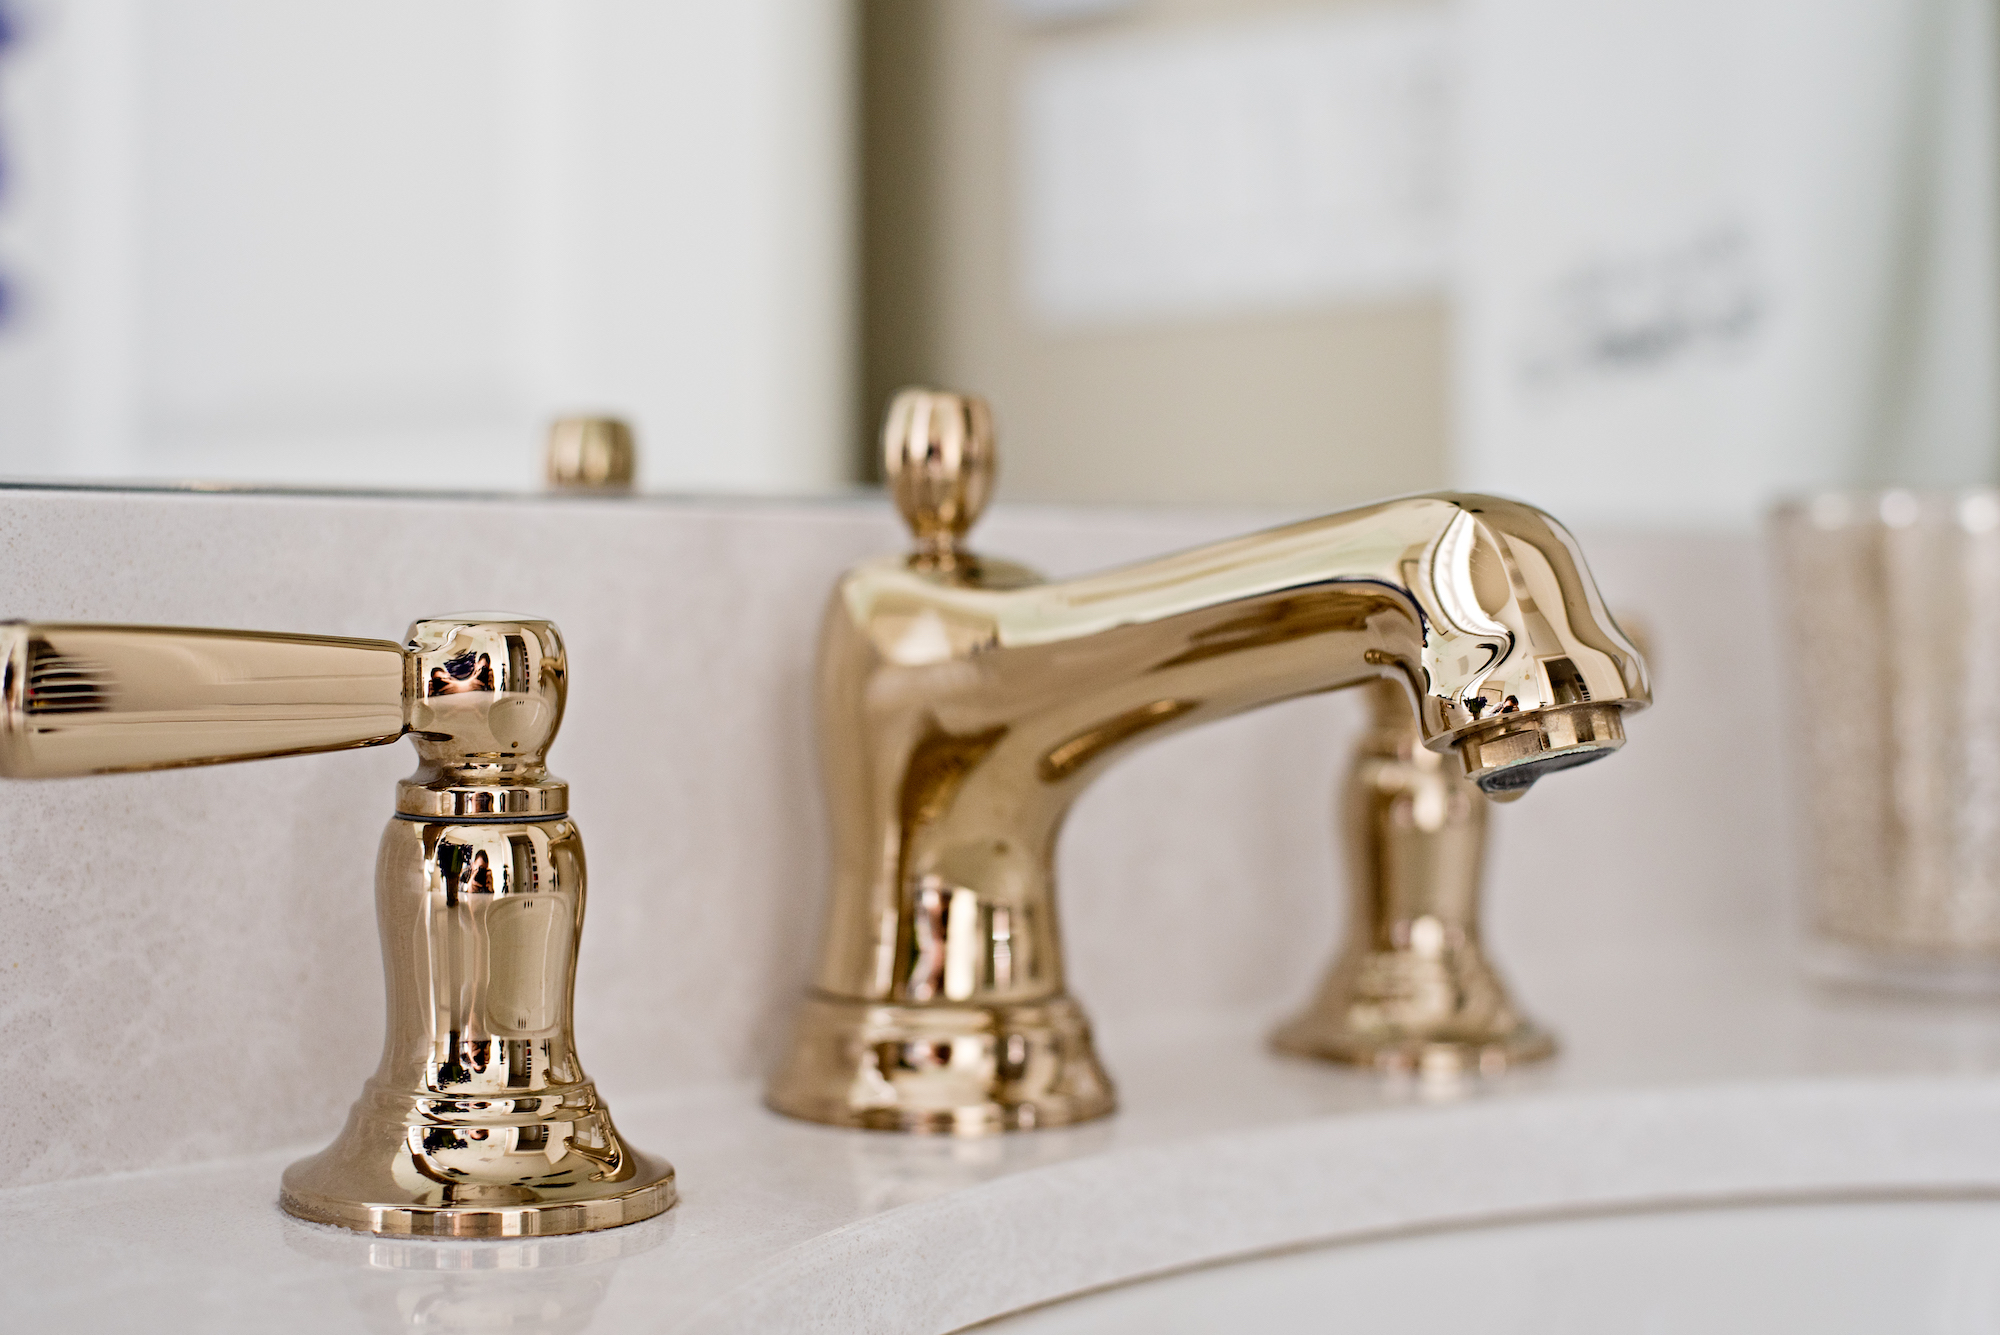 12 Pizzale Design Interior Decorating  bathroom elegant gold hardware.jpg